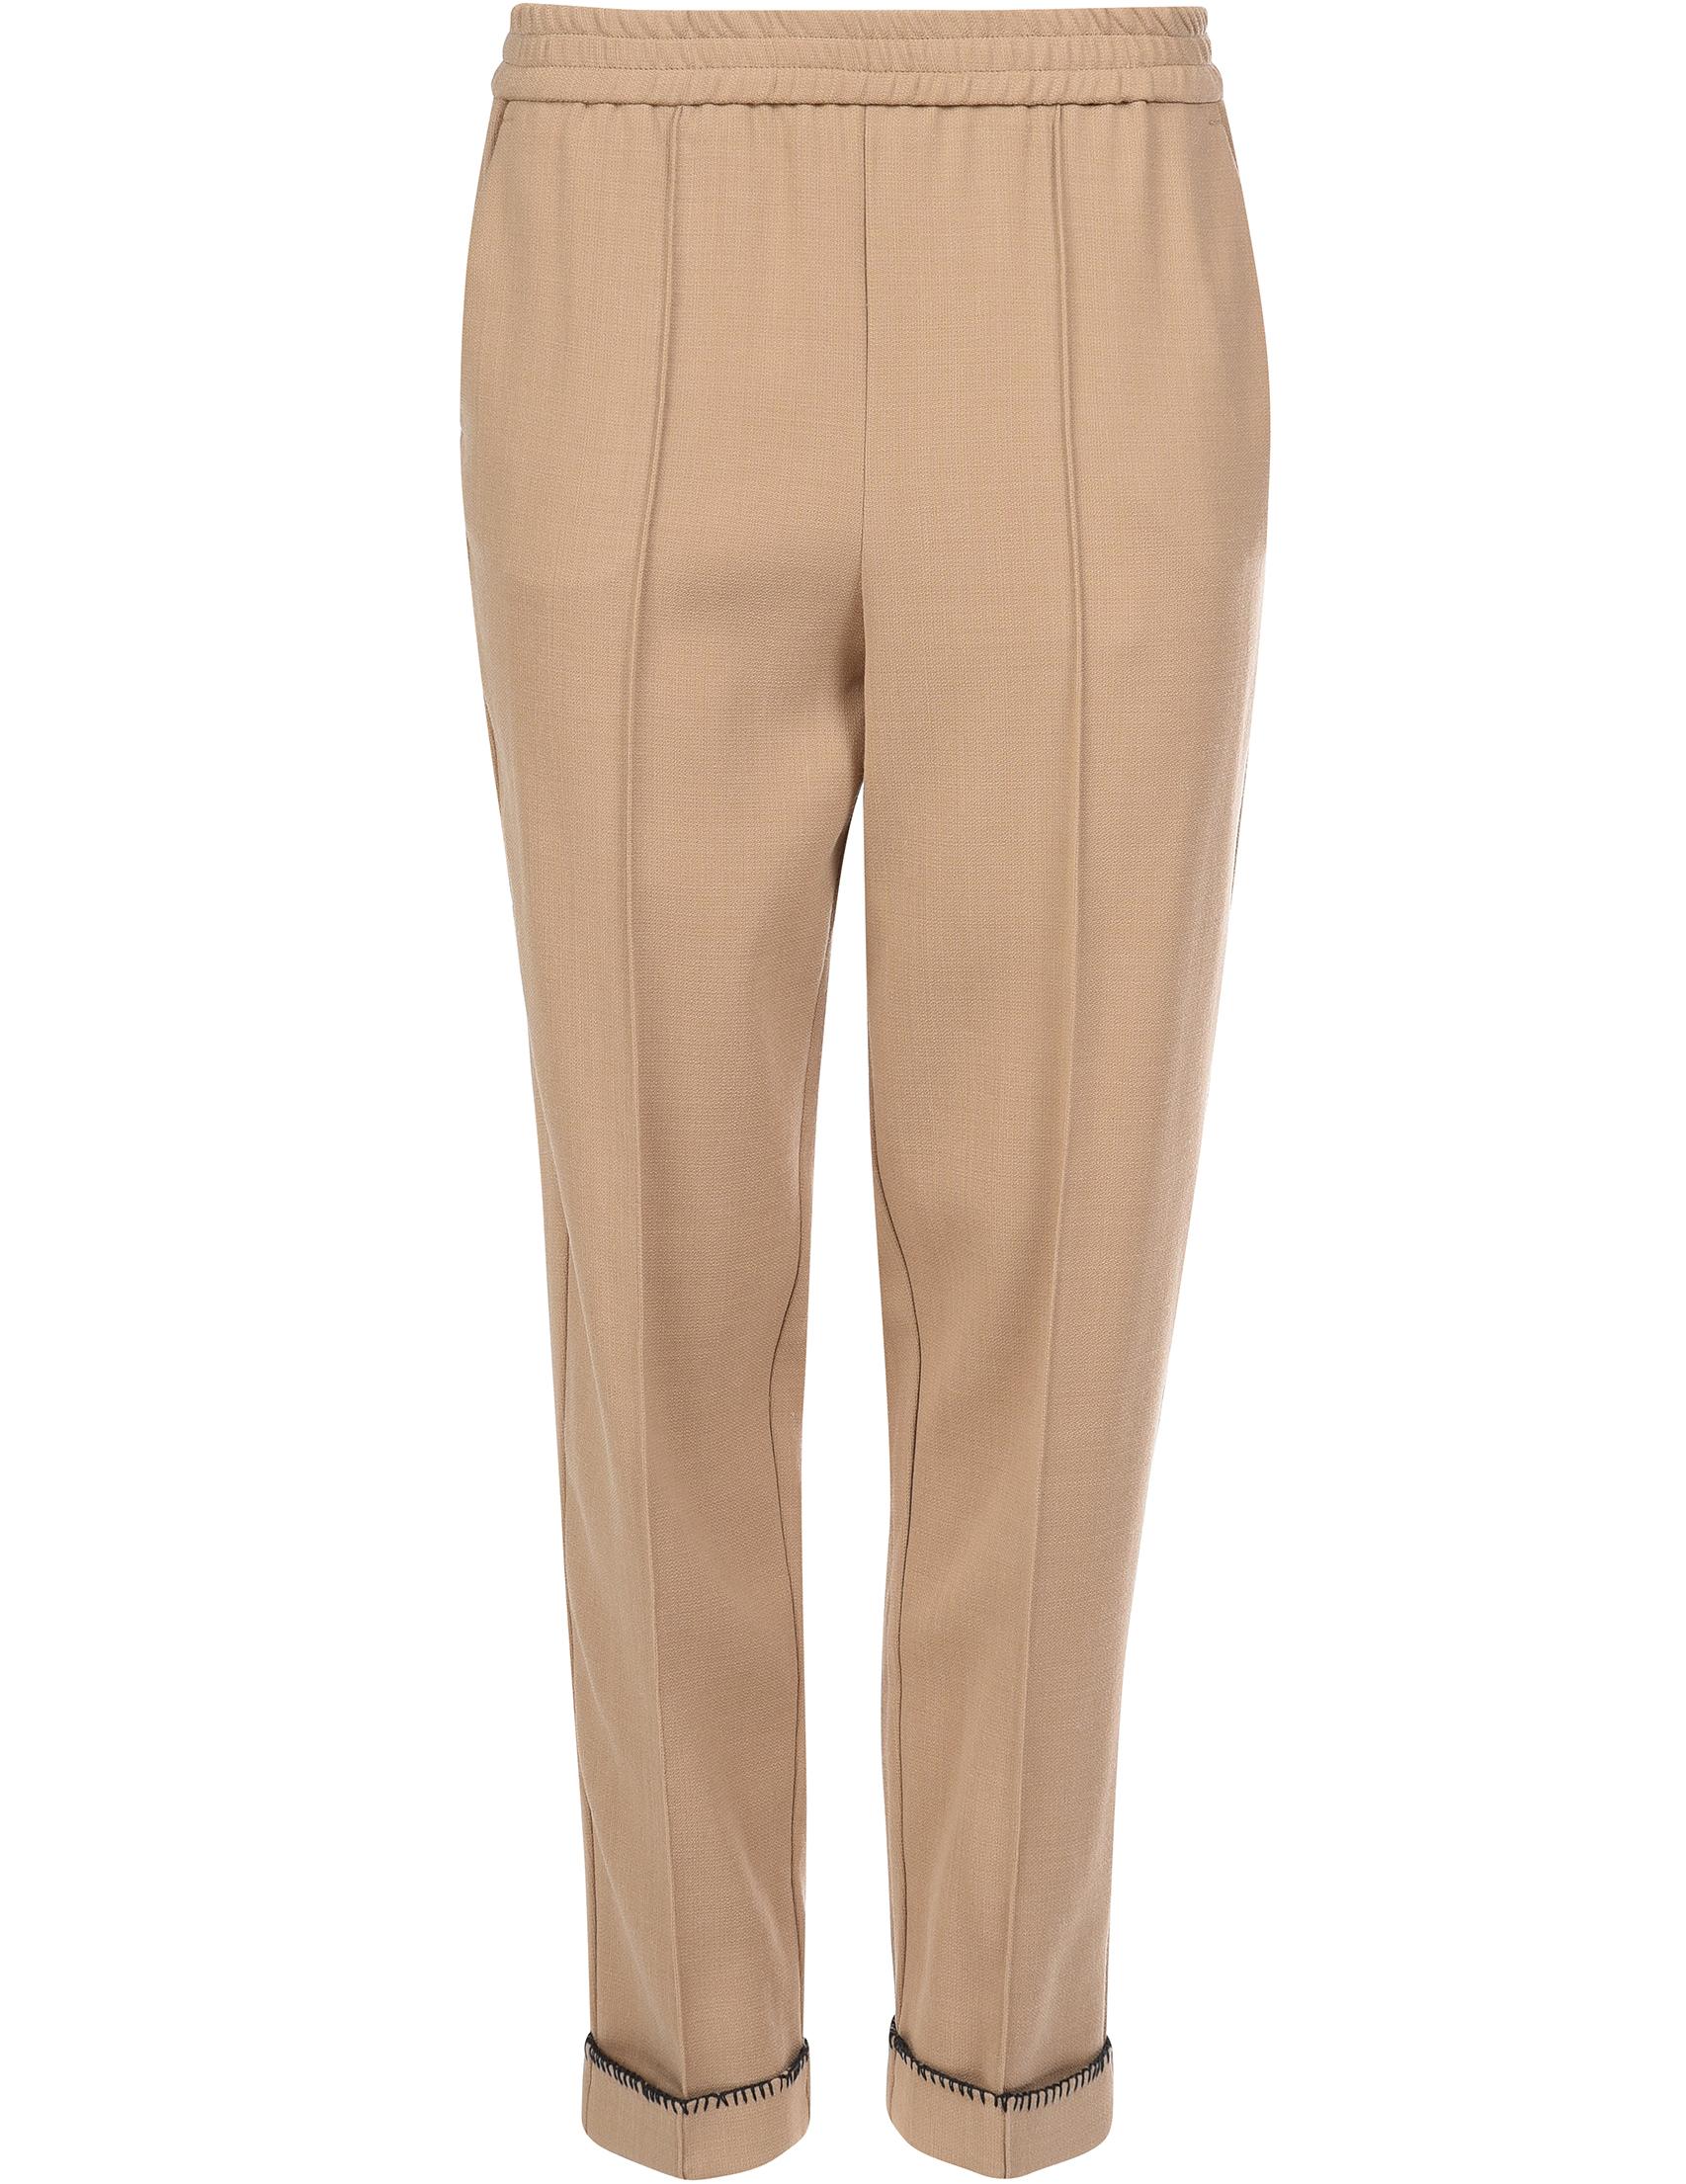 Женские брюки BALLANTYNE NLT044-14103_beige